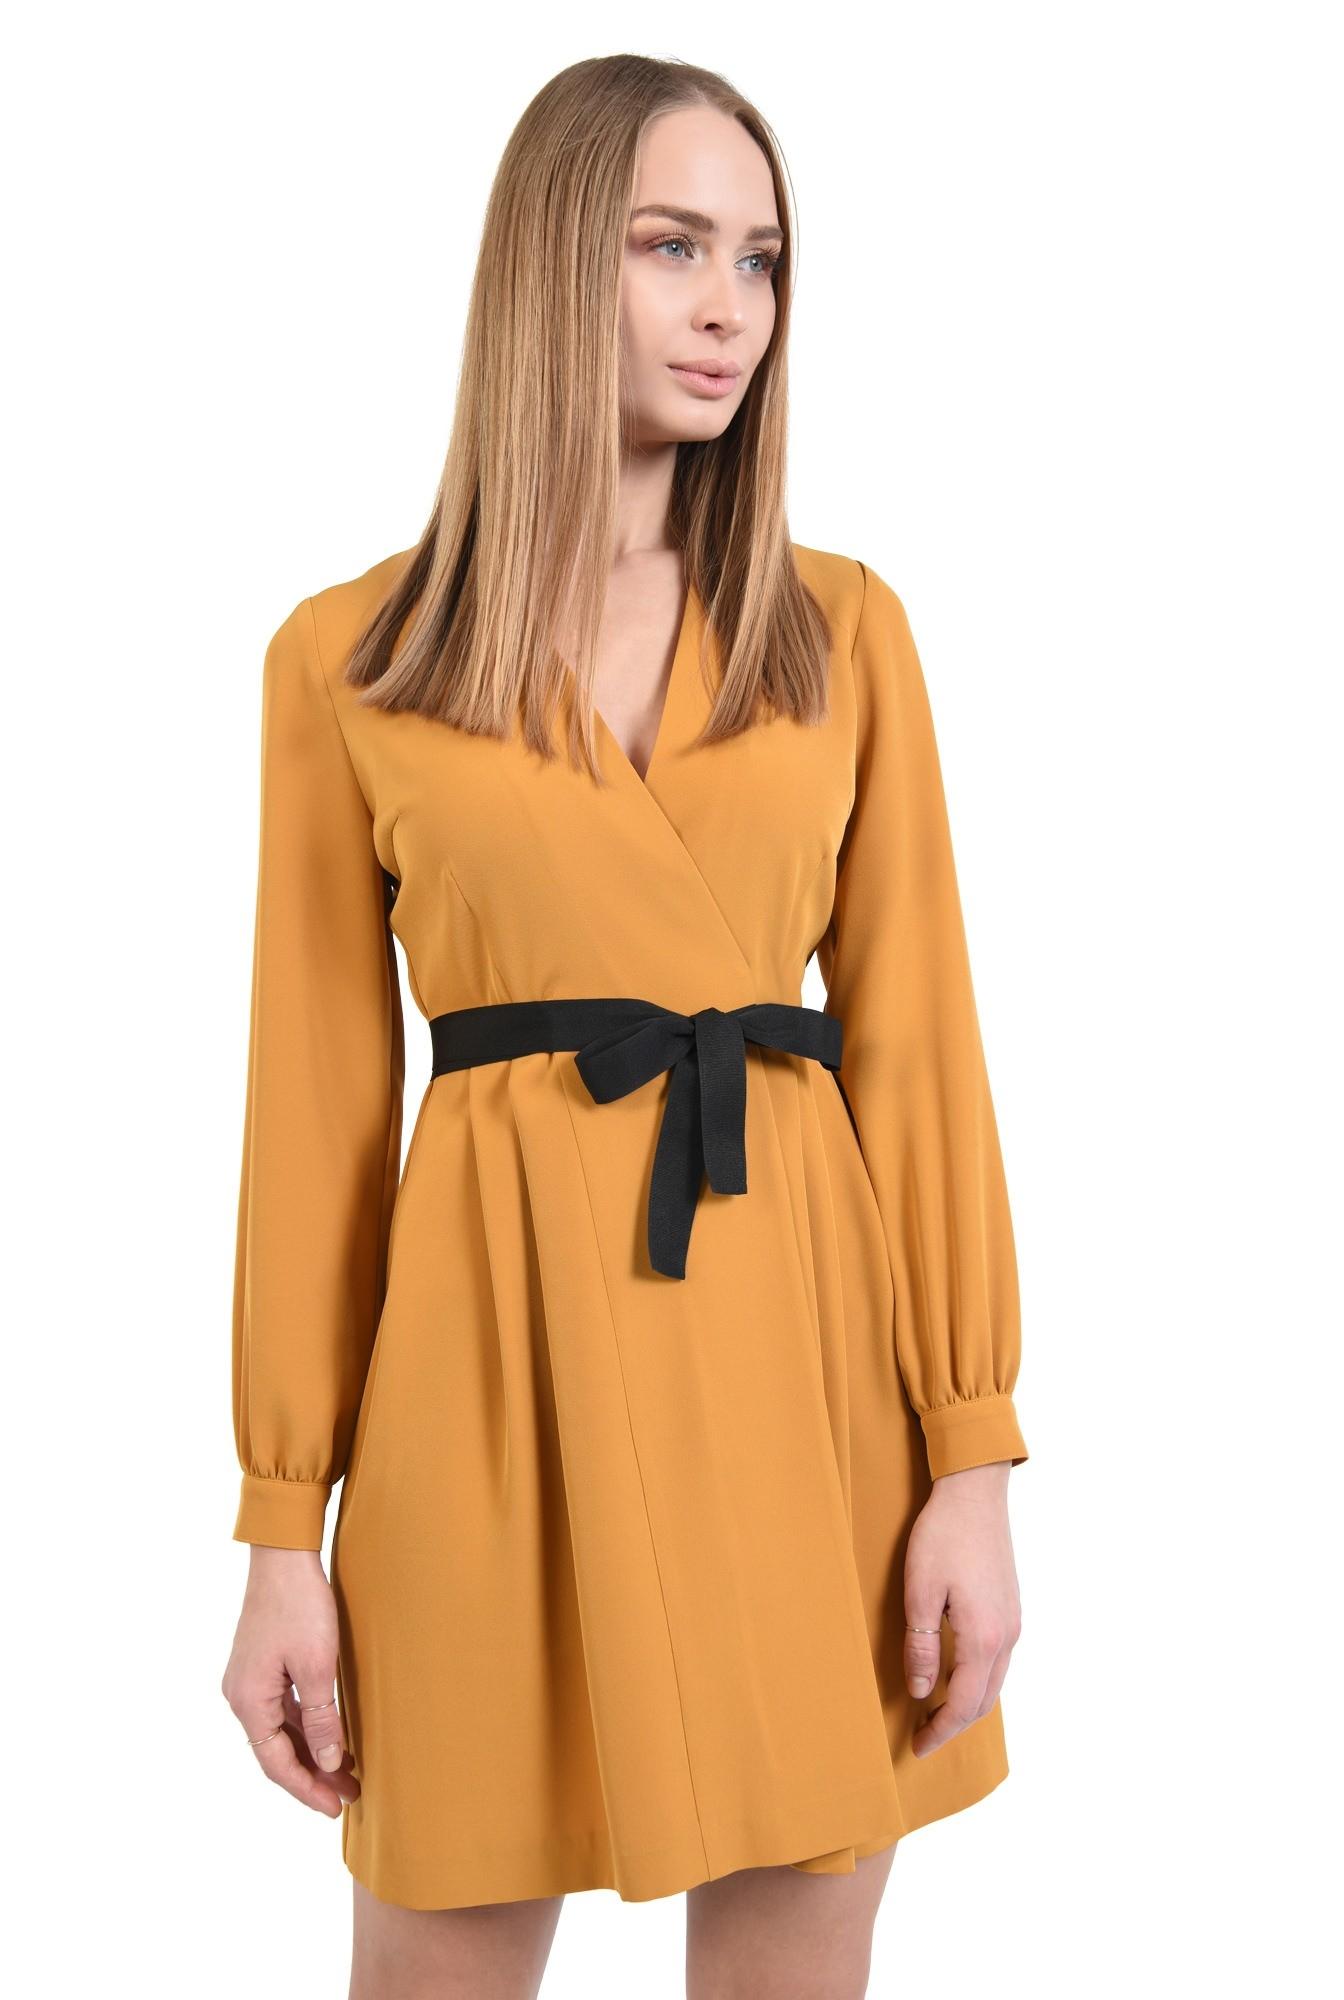 rochie mustar, anchior petrecut, maneci lungi cu manseta, croi parte peste parte